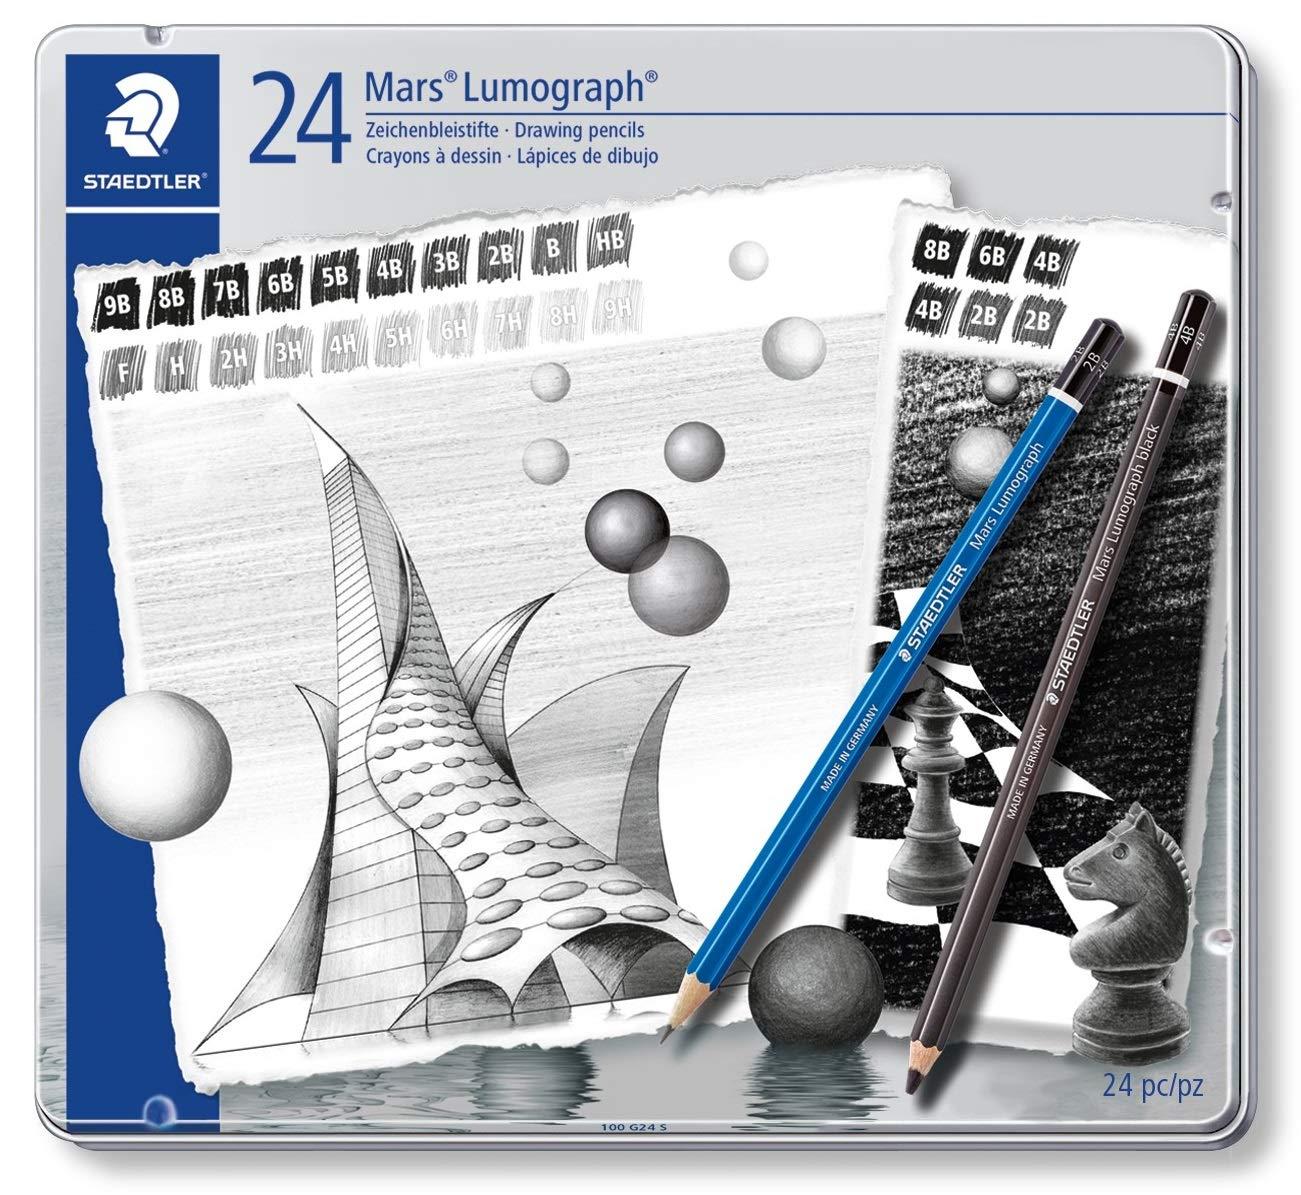 STAEDTLER Mars Lumograph 100 G24 S ST Pack de 24 Lápices de Dibujo de Distinta Dureza, Negro